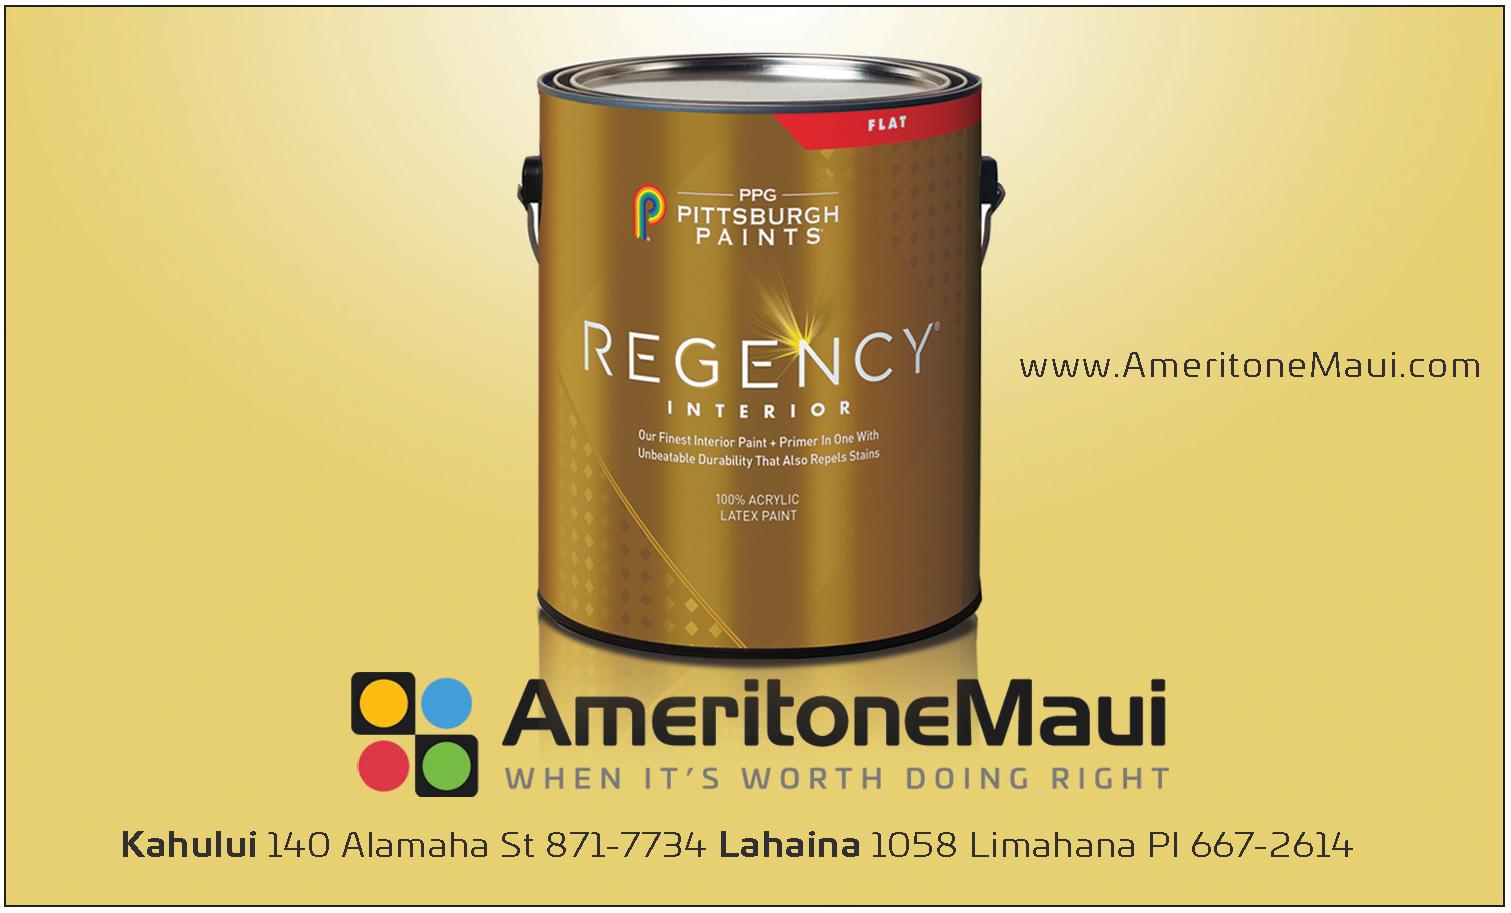 AmeritoneMaui